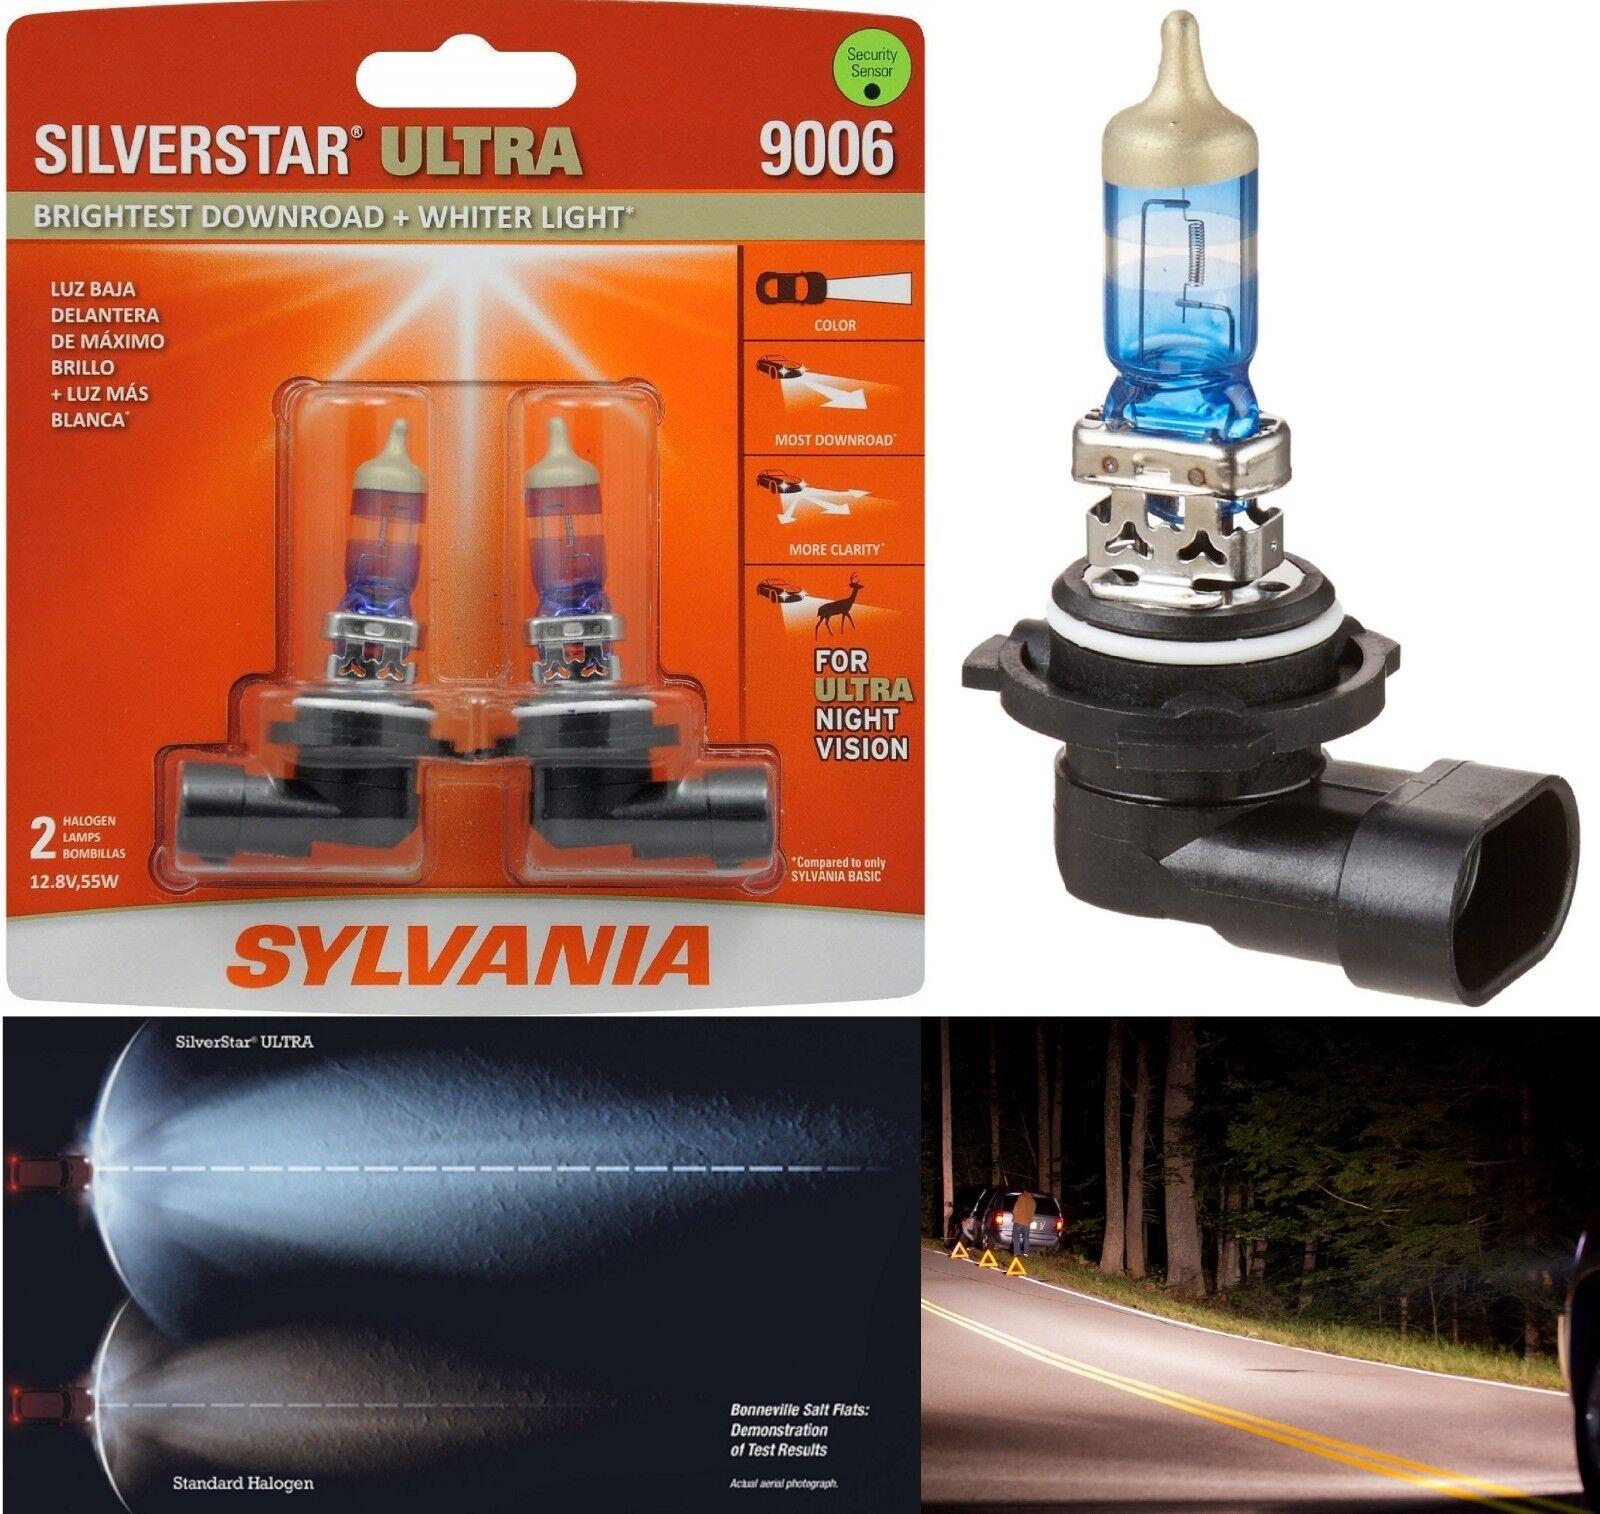 Sylvania Silverstar Ultra 9006 HB4 55W Two Bulbs Head Light Replacement Low Beam